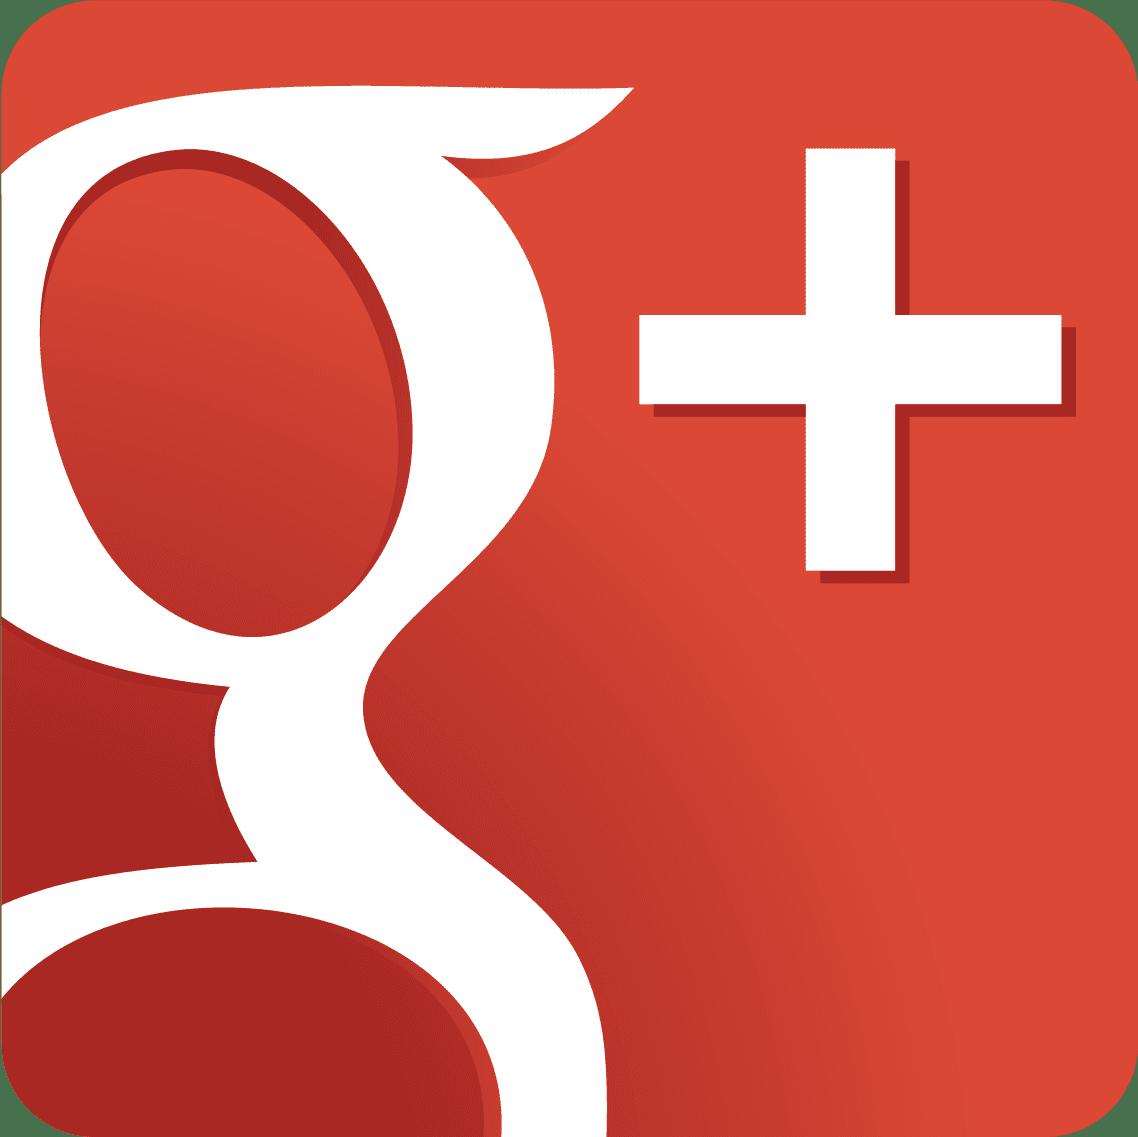 Chris' Google+